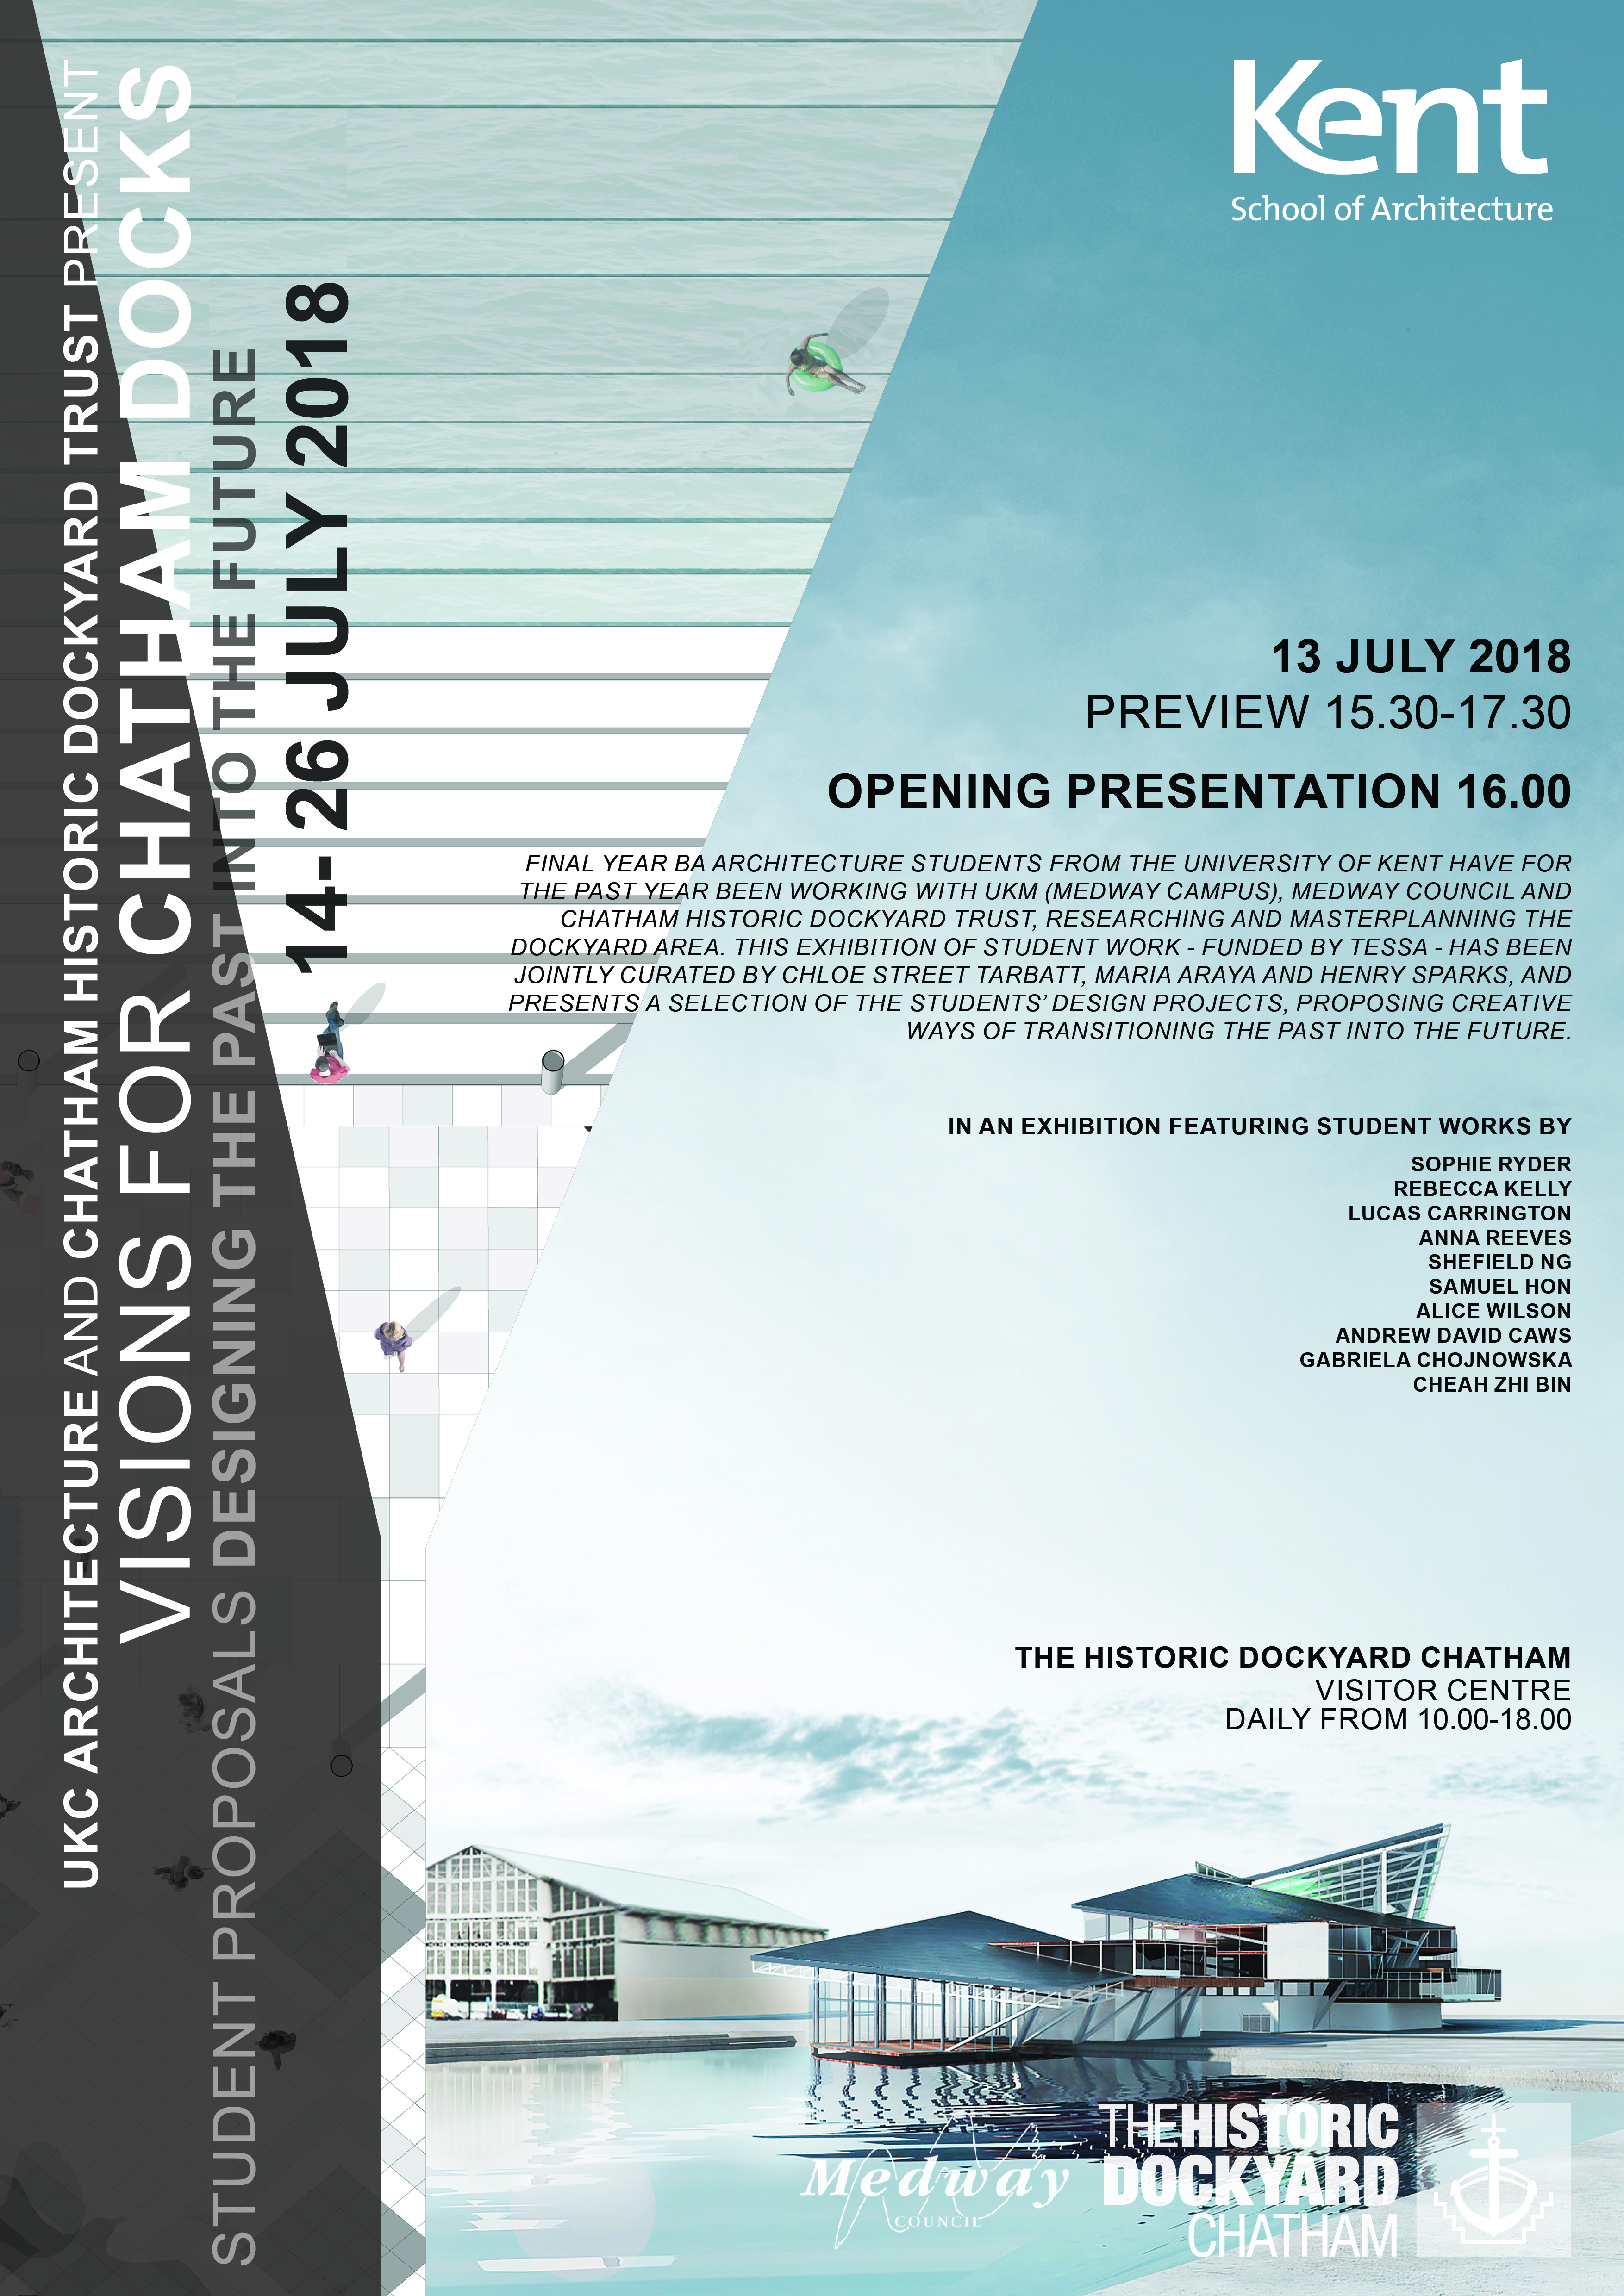 Visions for Chatham Dockyard - Chatham Historic Dockyard Trust